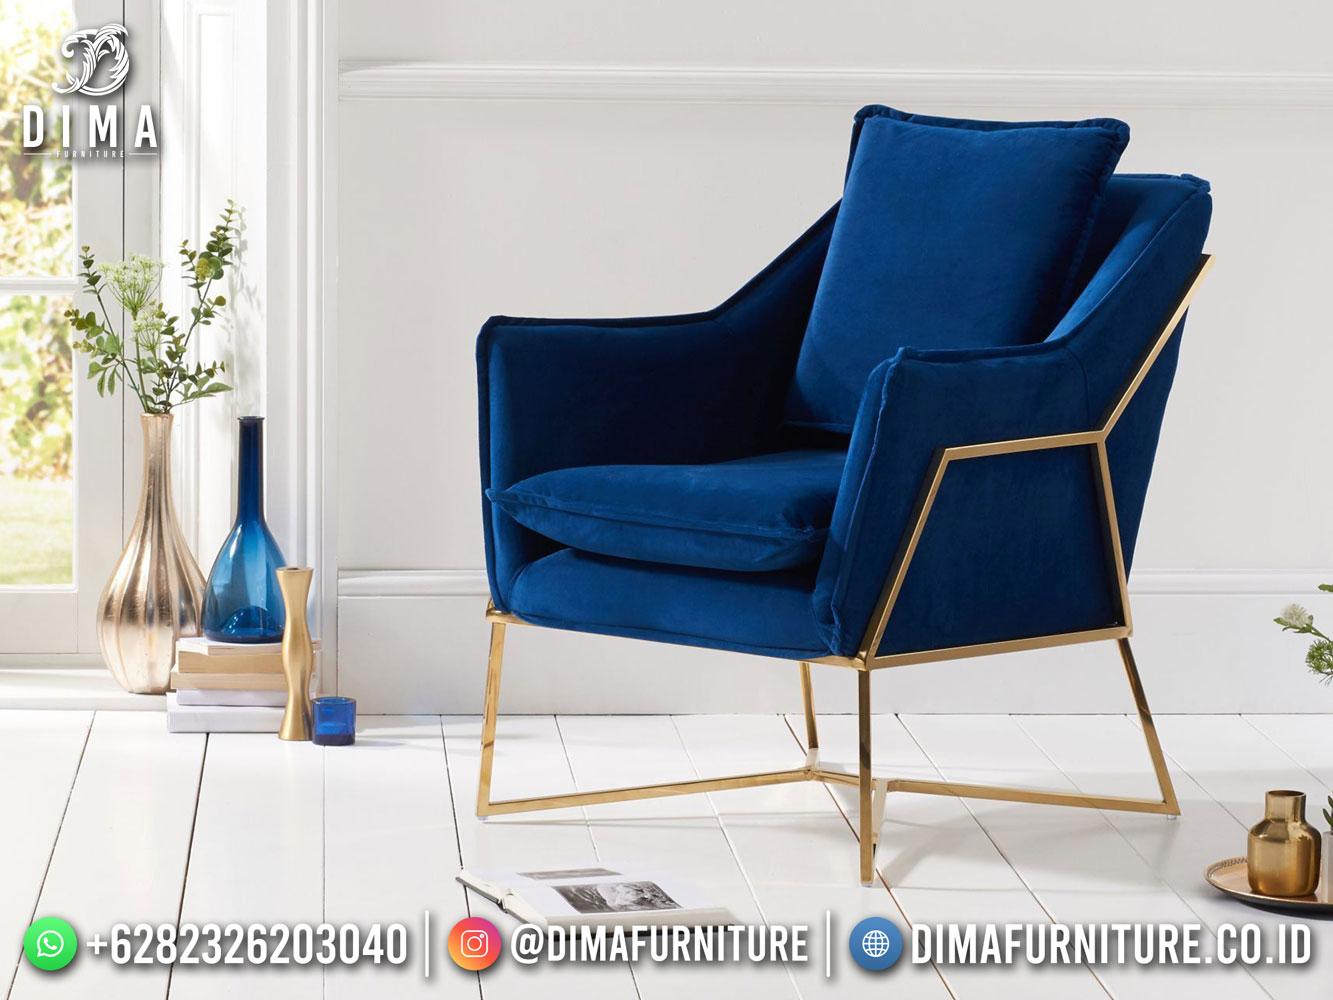 Exclusive Model Sofa Minimalis New Design Industrial Furniture TTJ-1797